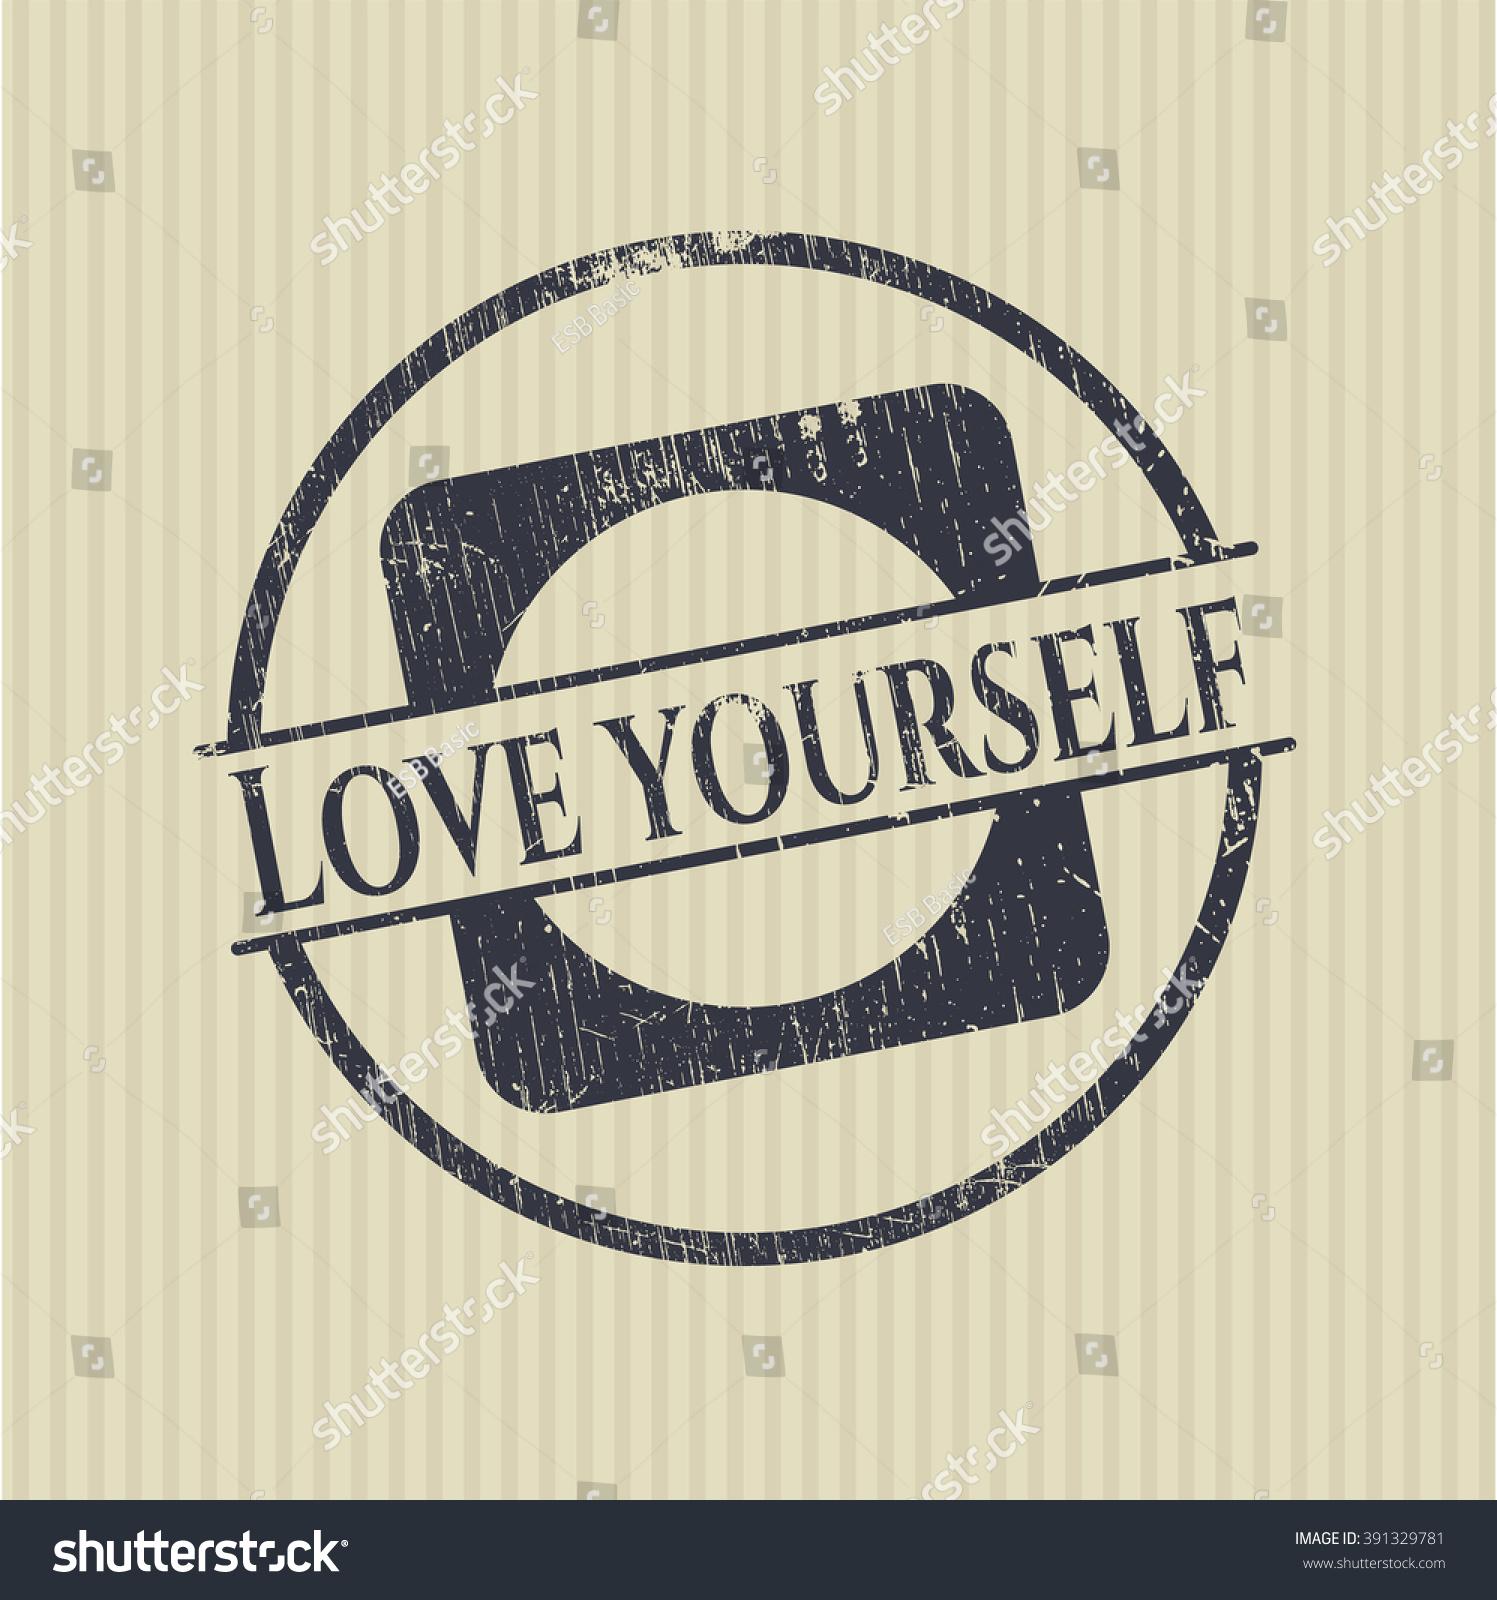 Love yourself rubber stamp grunge texture stock vector 391329781 love yourself rubber stamp with grunge texture buycottarizona